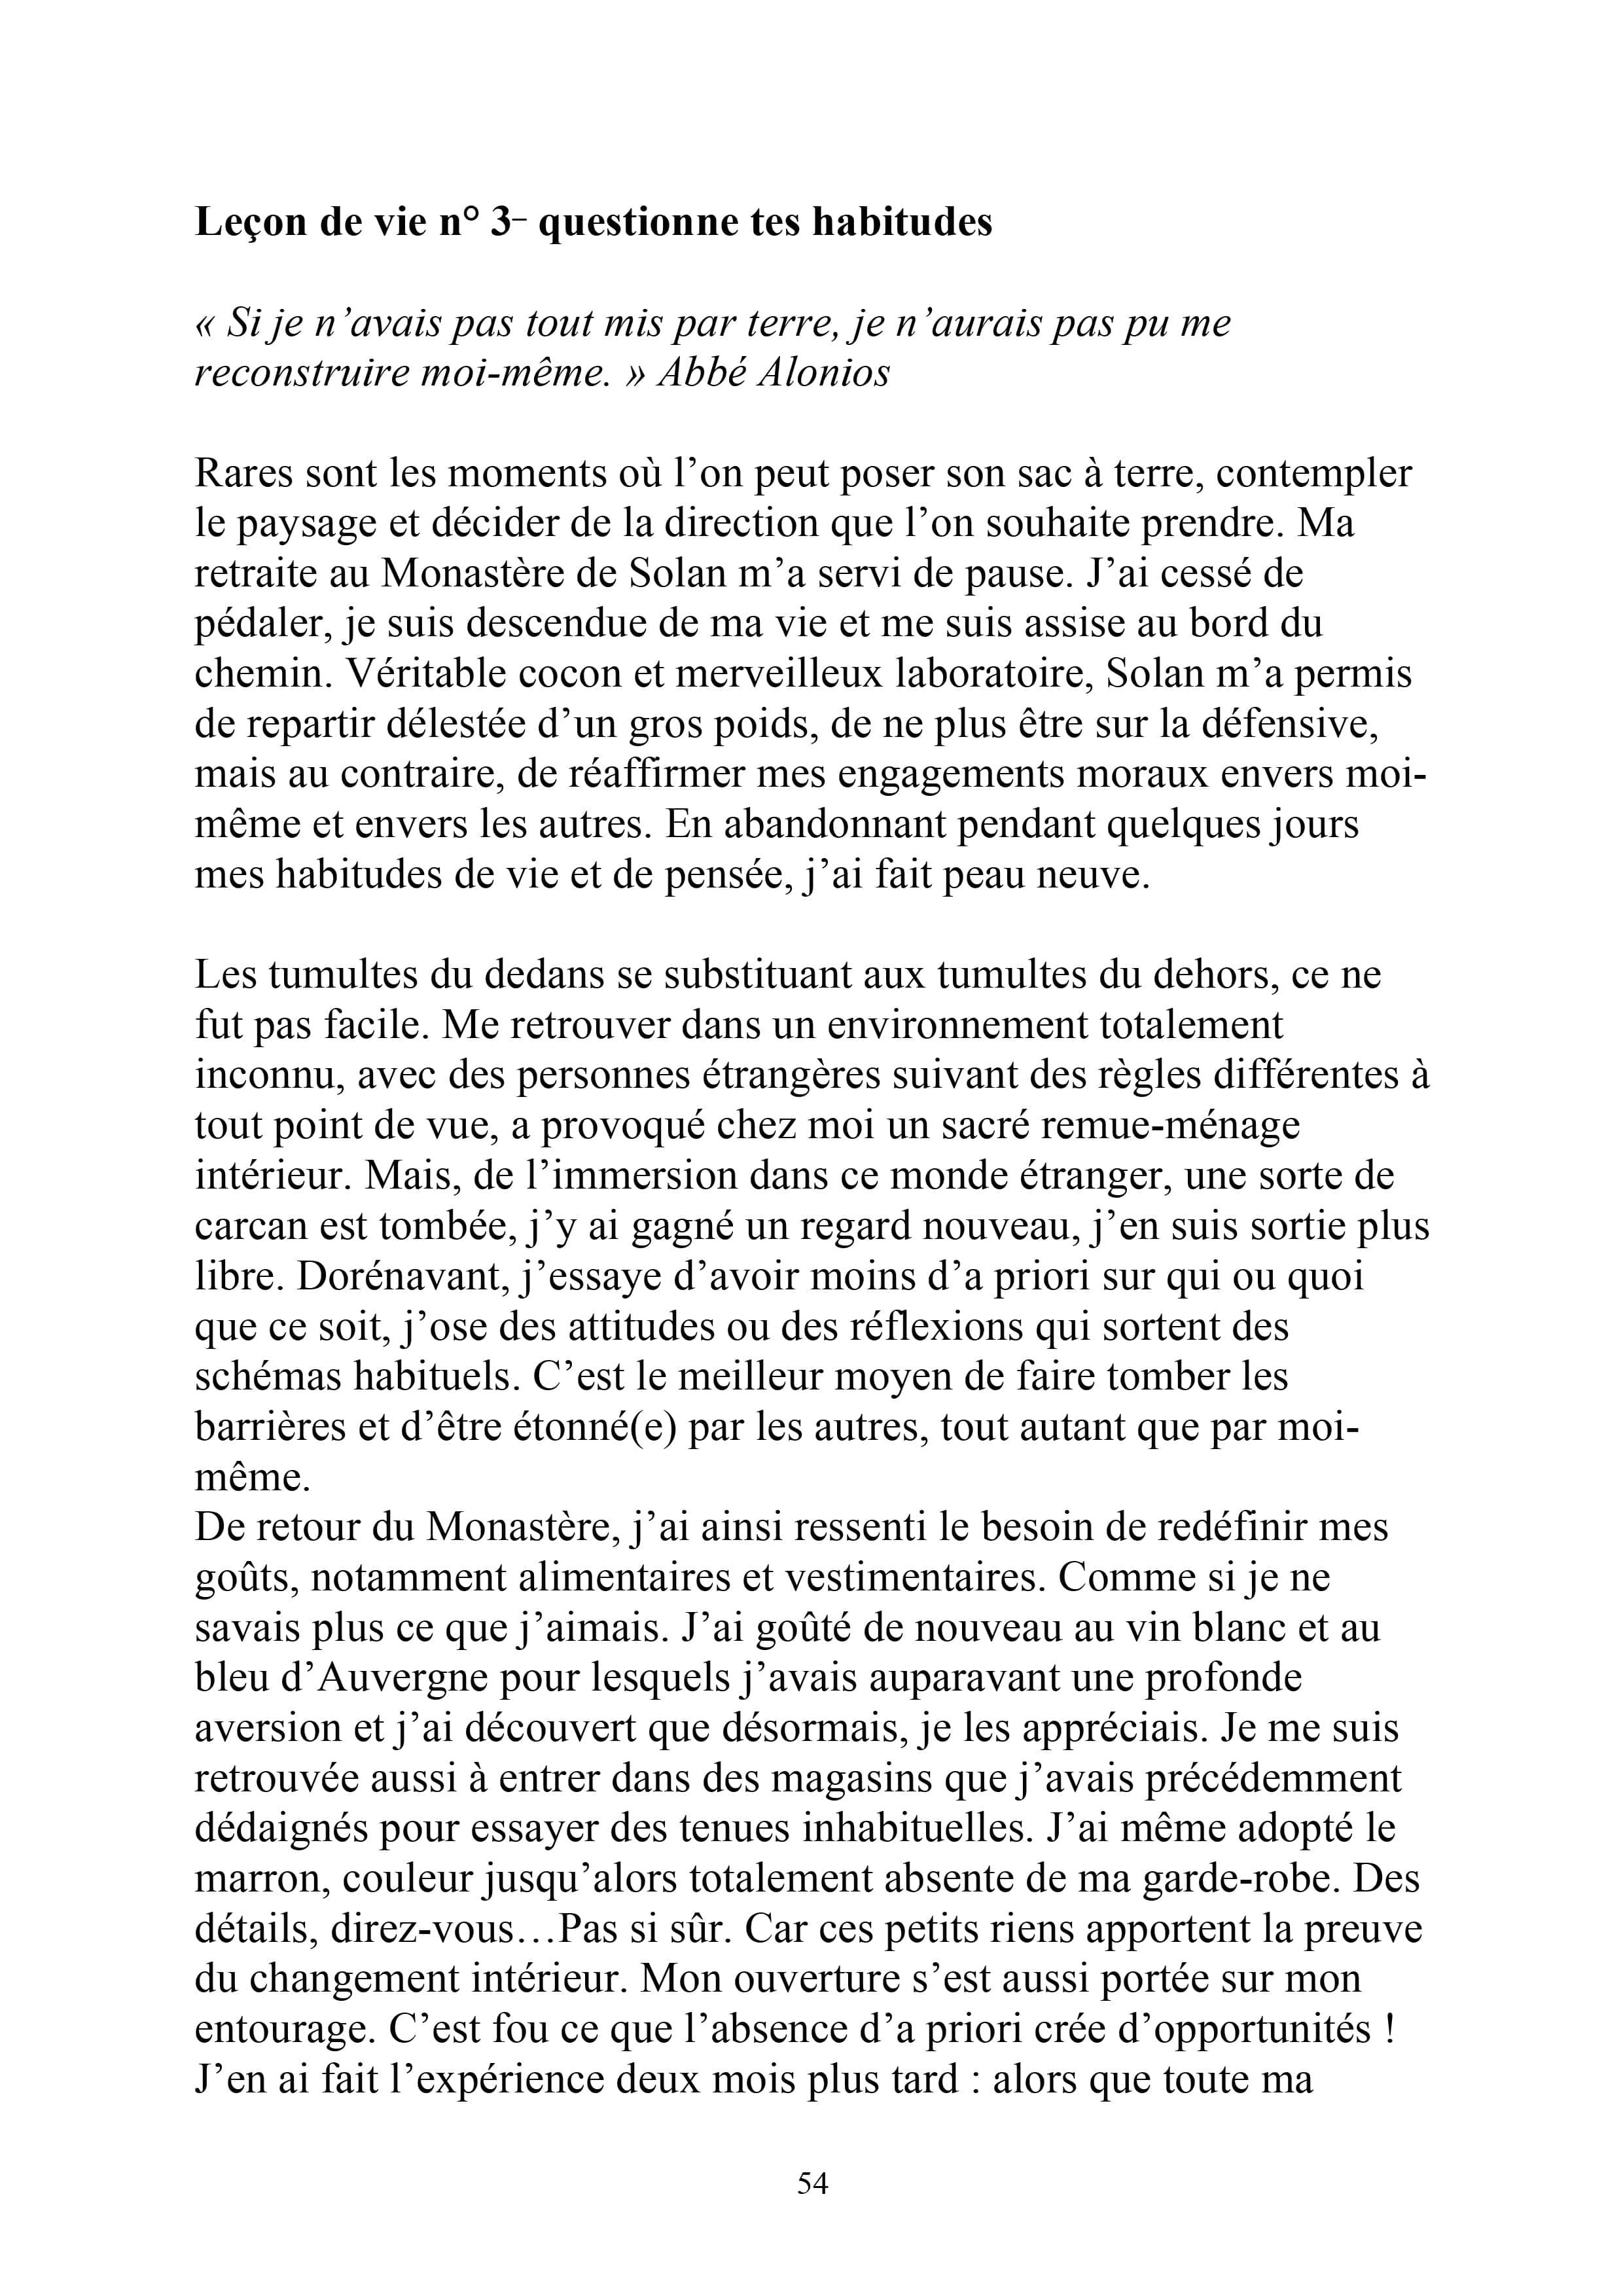 Ebook-Journal de retraite du monastère de solan-54.jpg